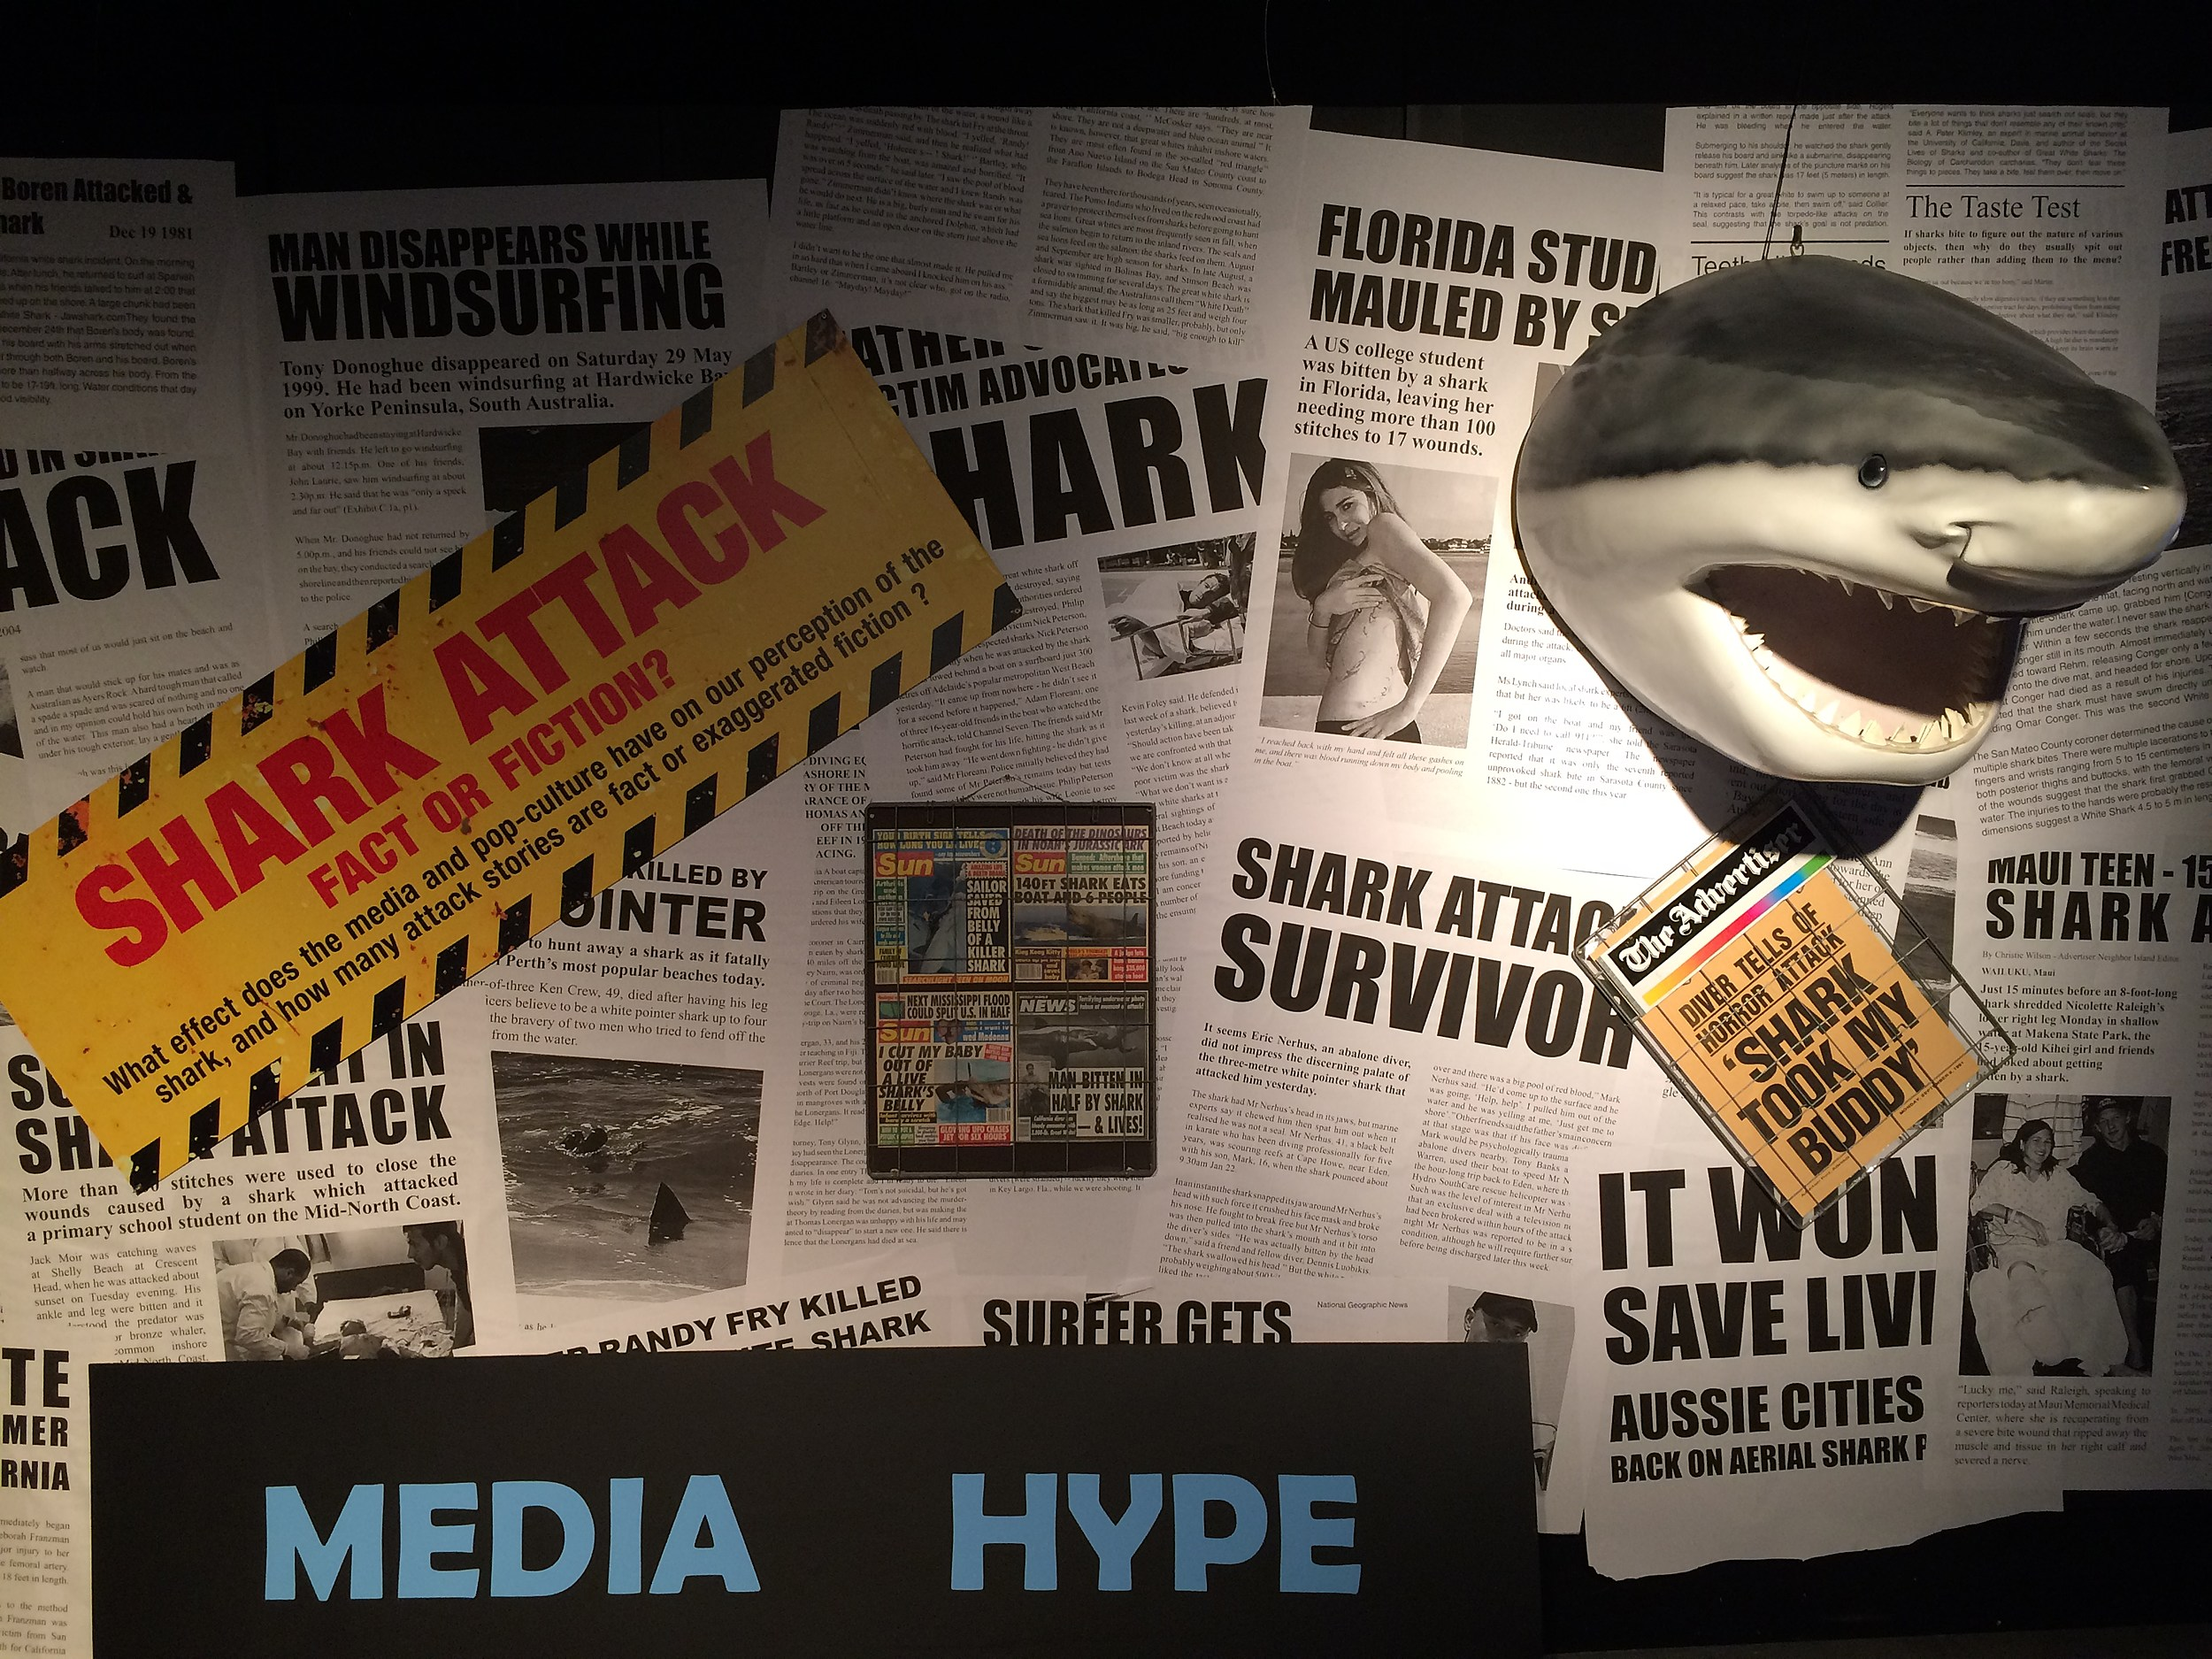 Planet Shark: Did Nikki Overcome Her Fear Of Sharks? [WATCH]